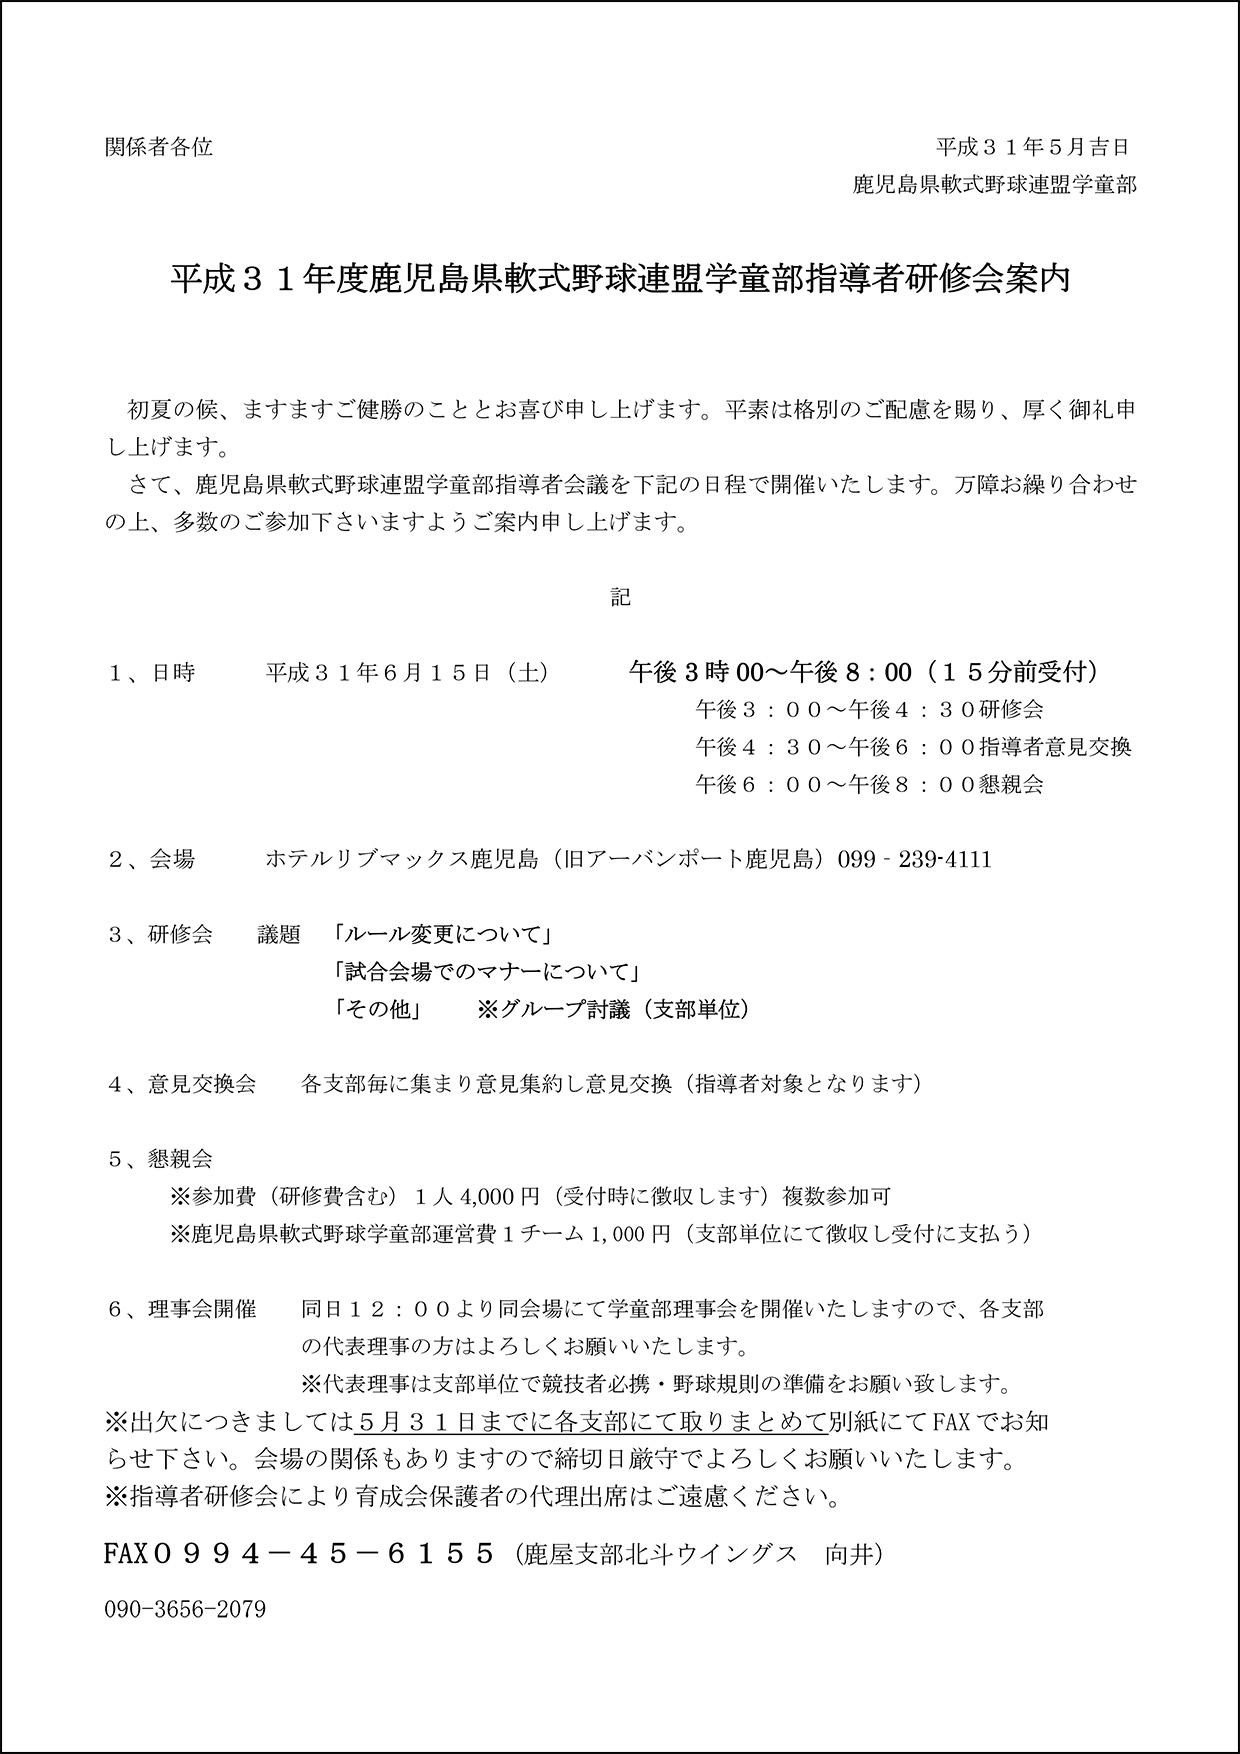 令和元年鹿児島県軟式野球連盟学童部指導者研修会のお知らせ